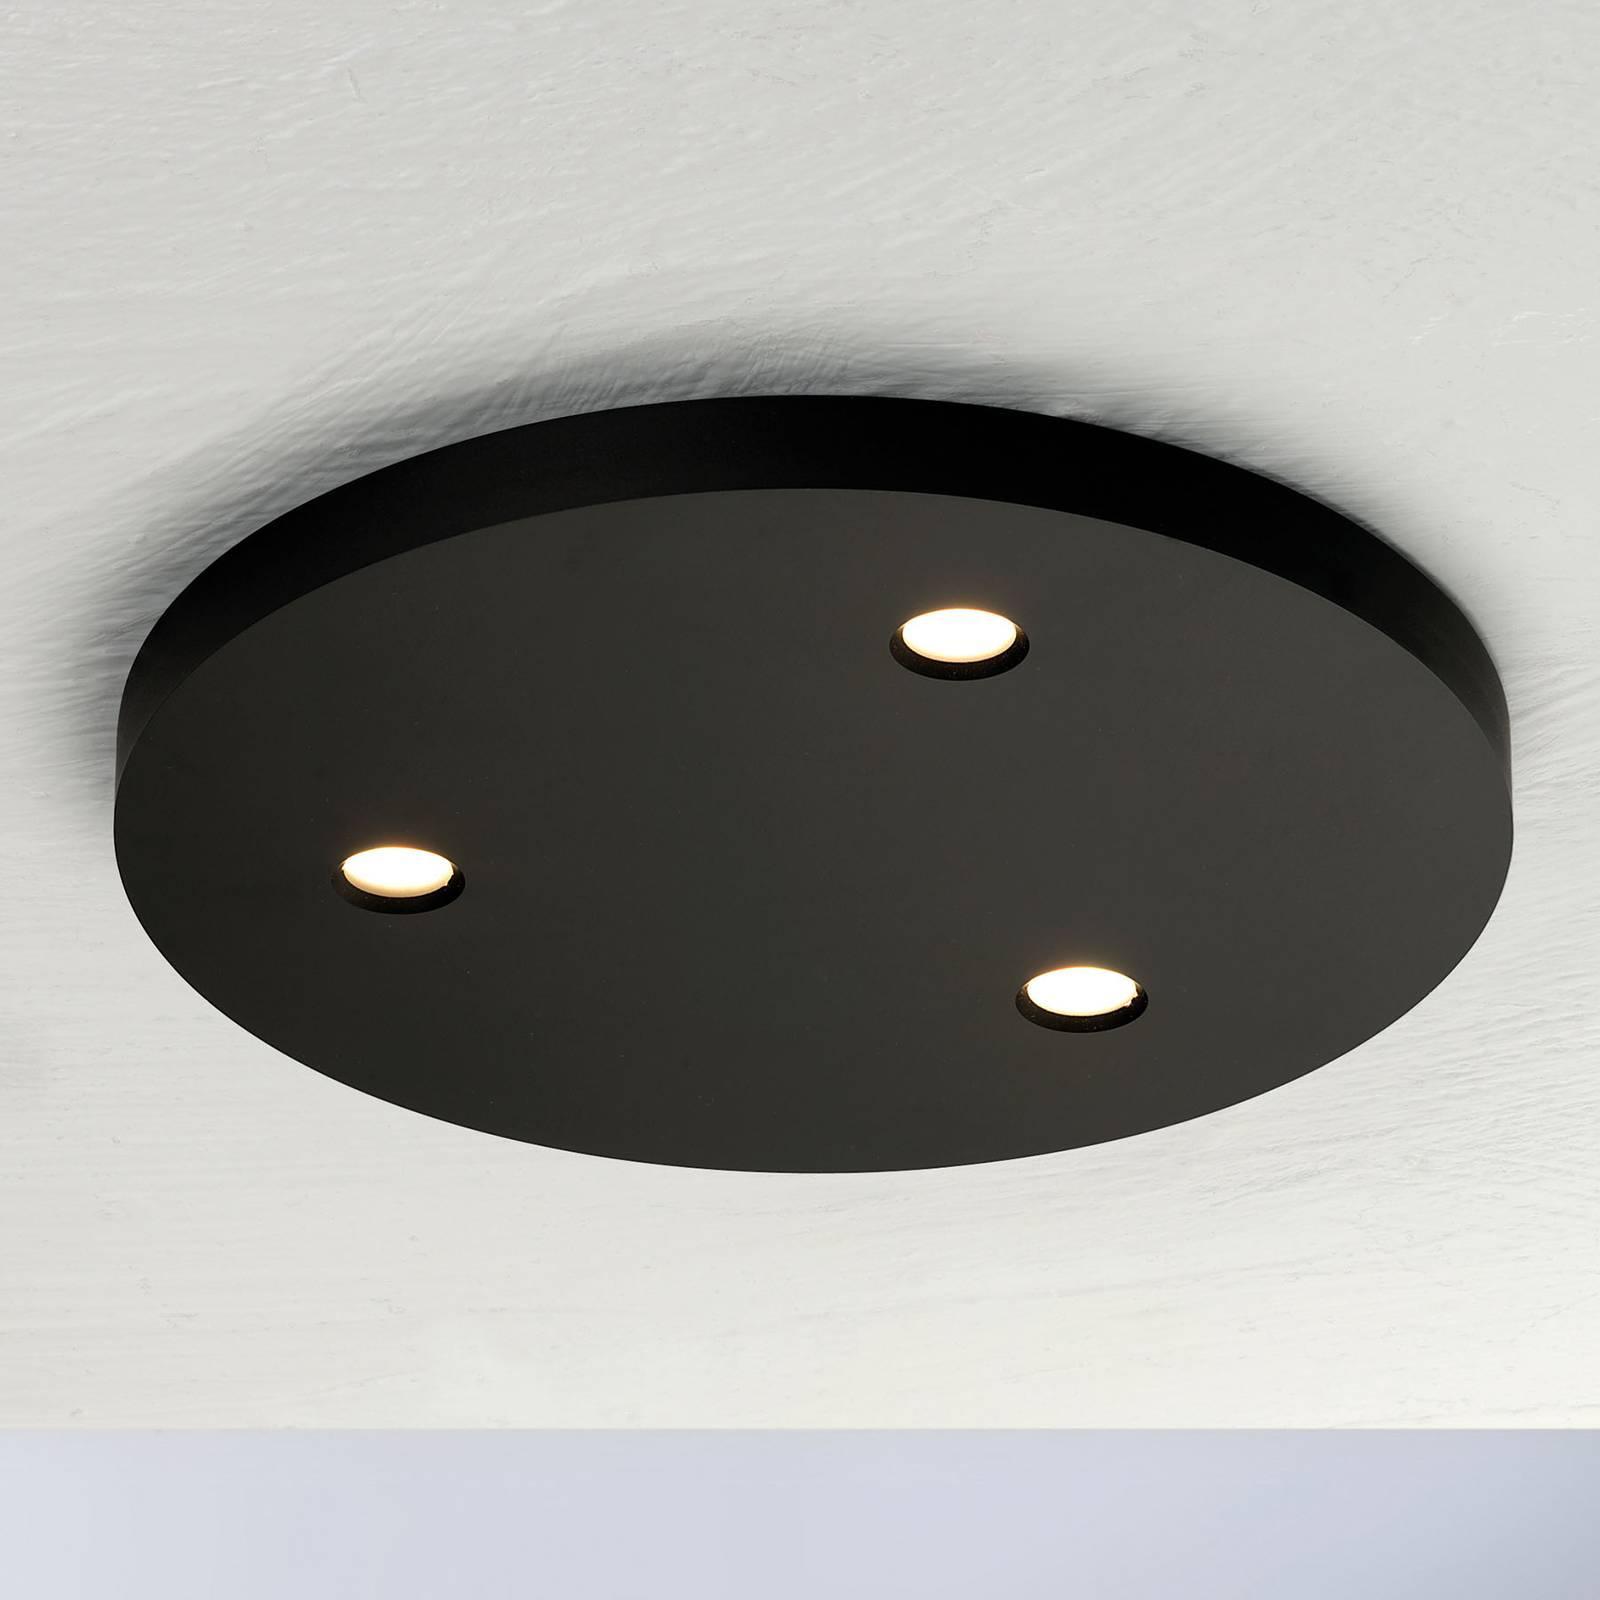 Bopp Close lampa sufitowa LED 3-pkt okrągła czarna